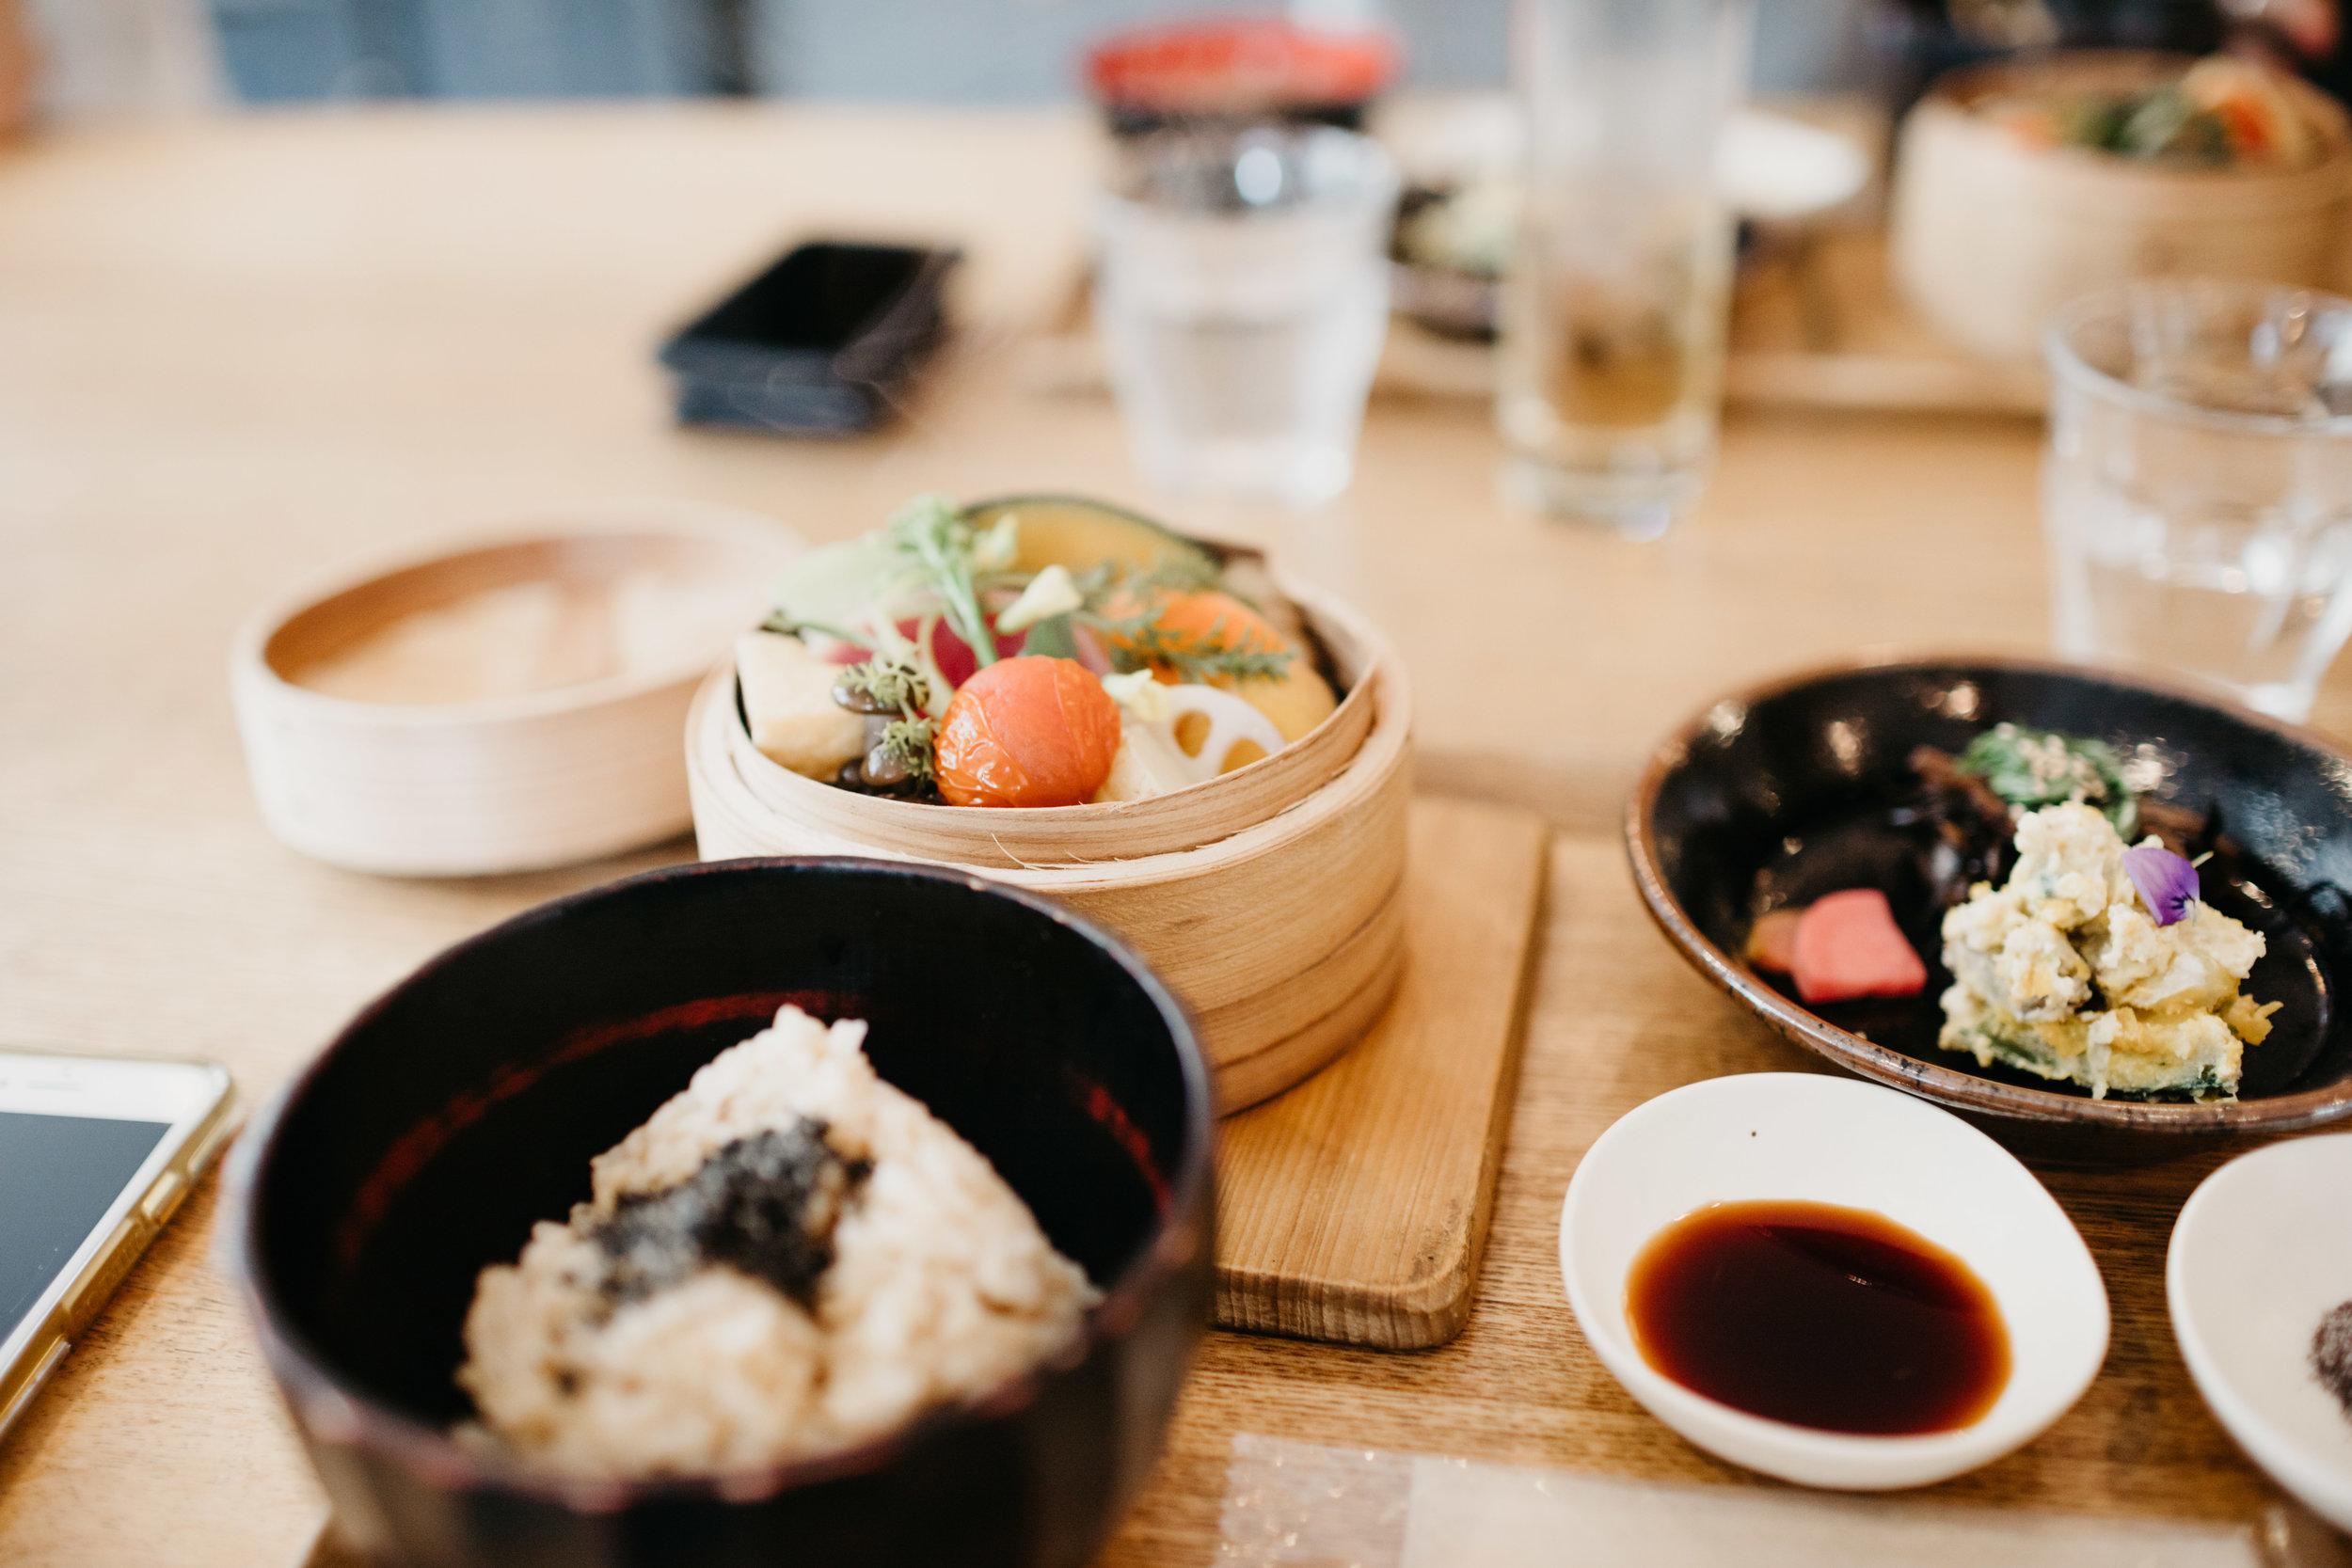 tokyo-street-photo-by-samantha-look.jpg